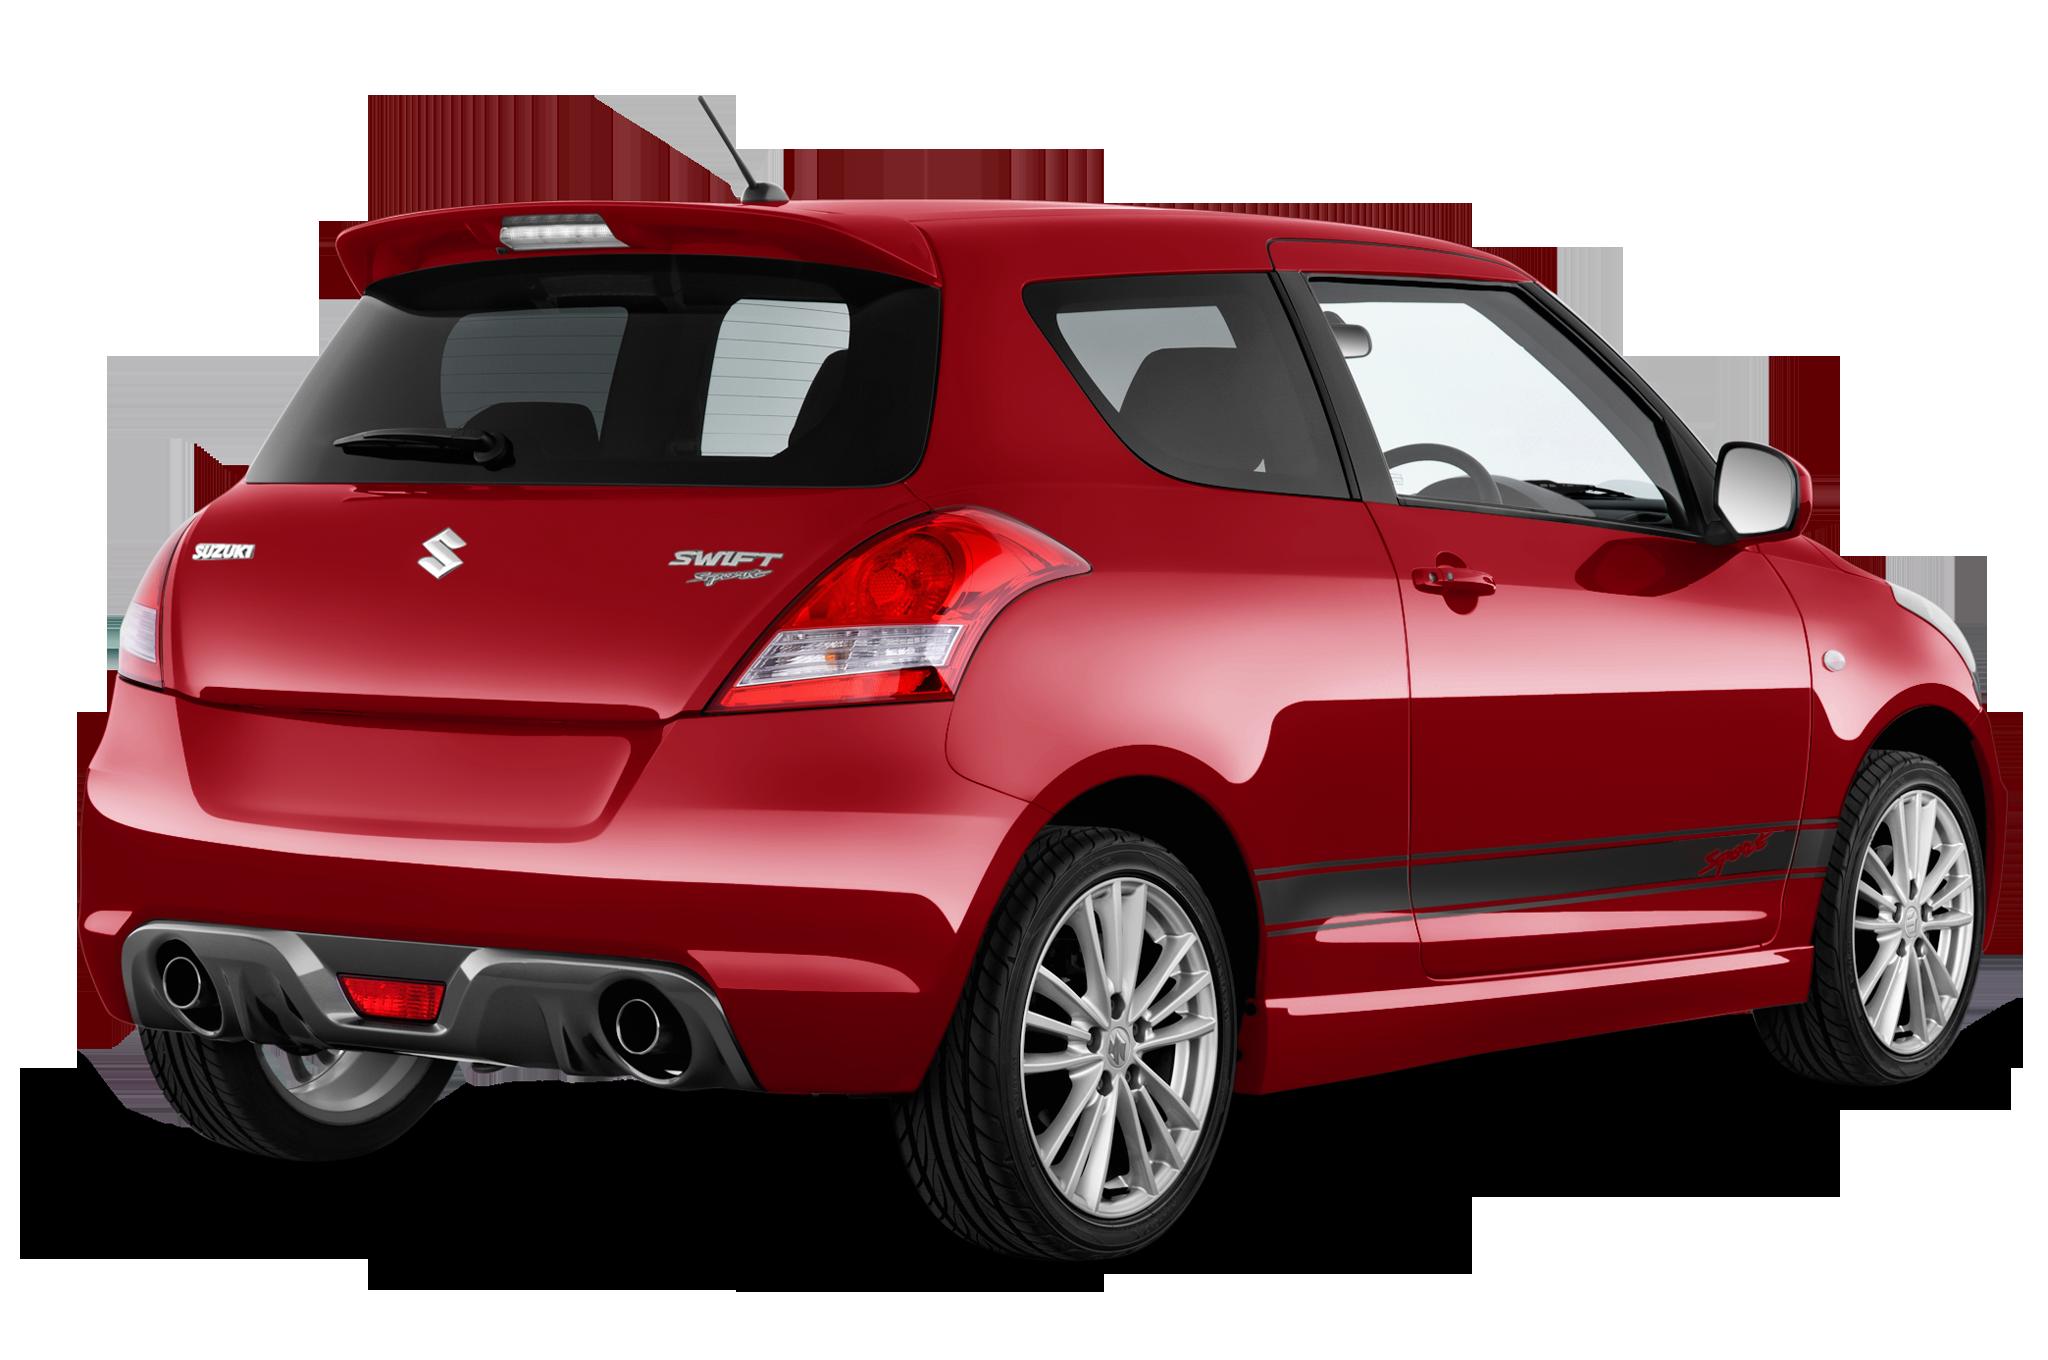 Suzuki Swift company car rear view